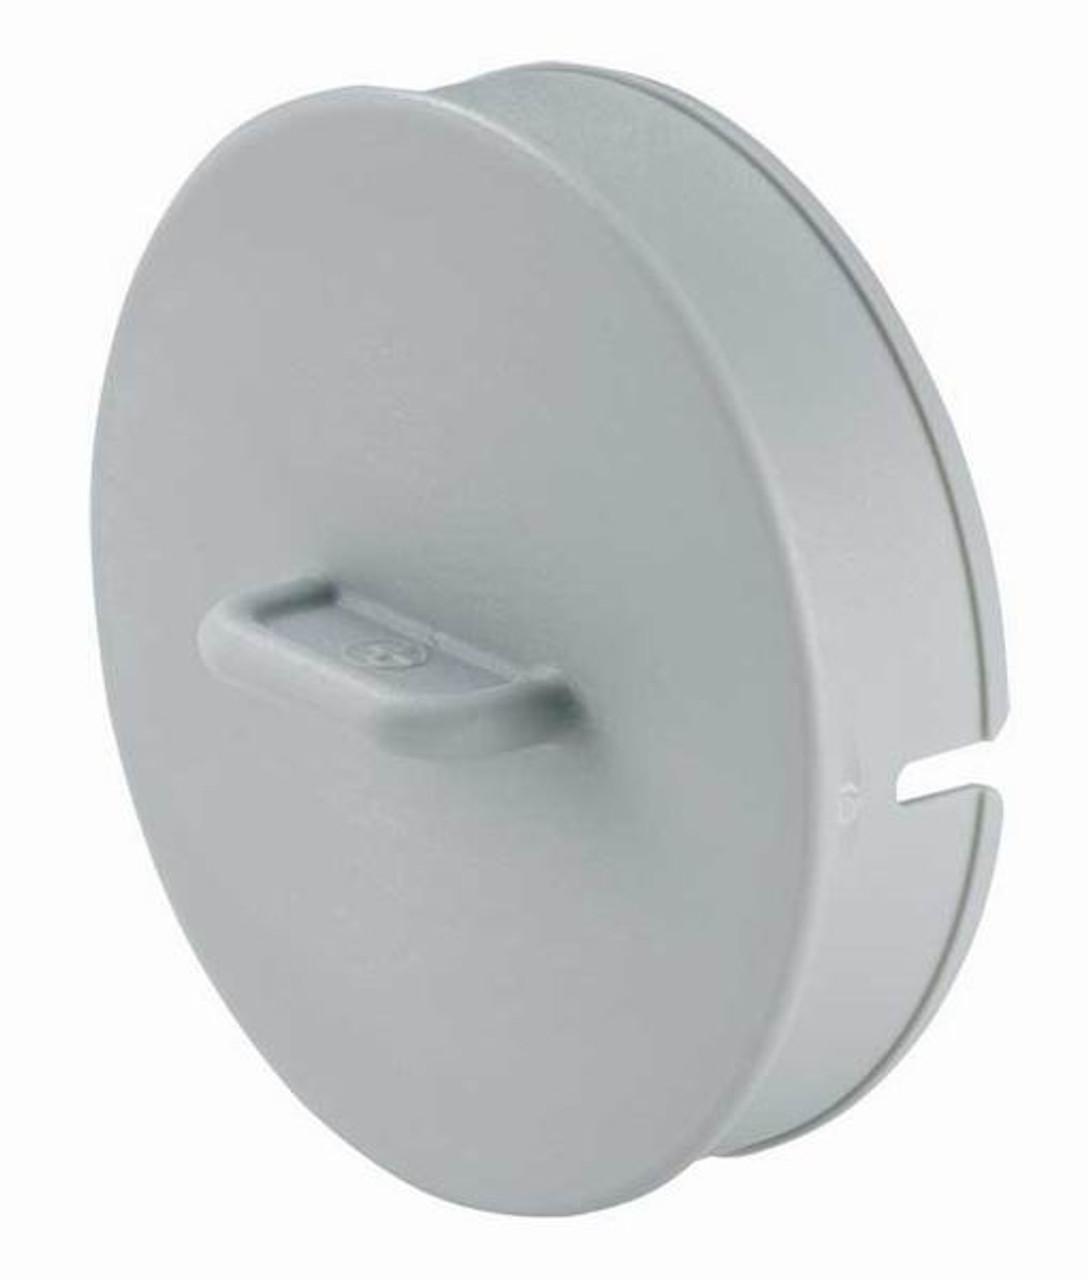 Truma Blown Air Heater Blanking Plug VD Fitting (40353-01)